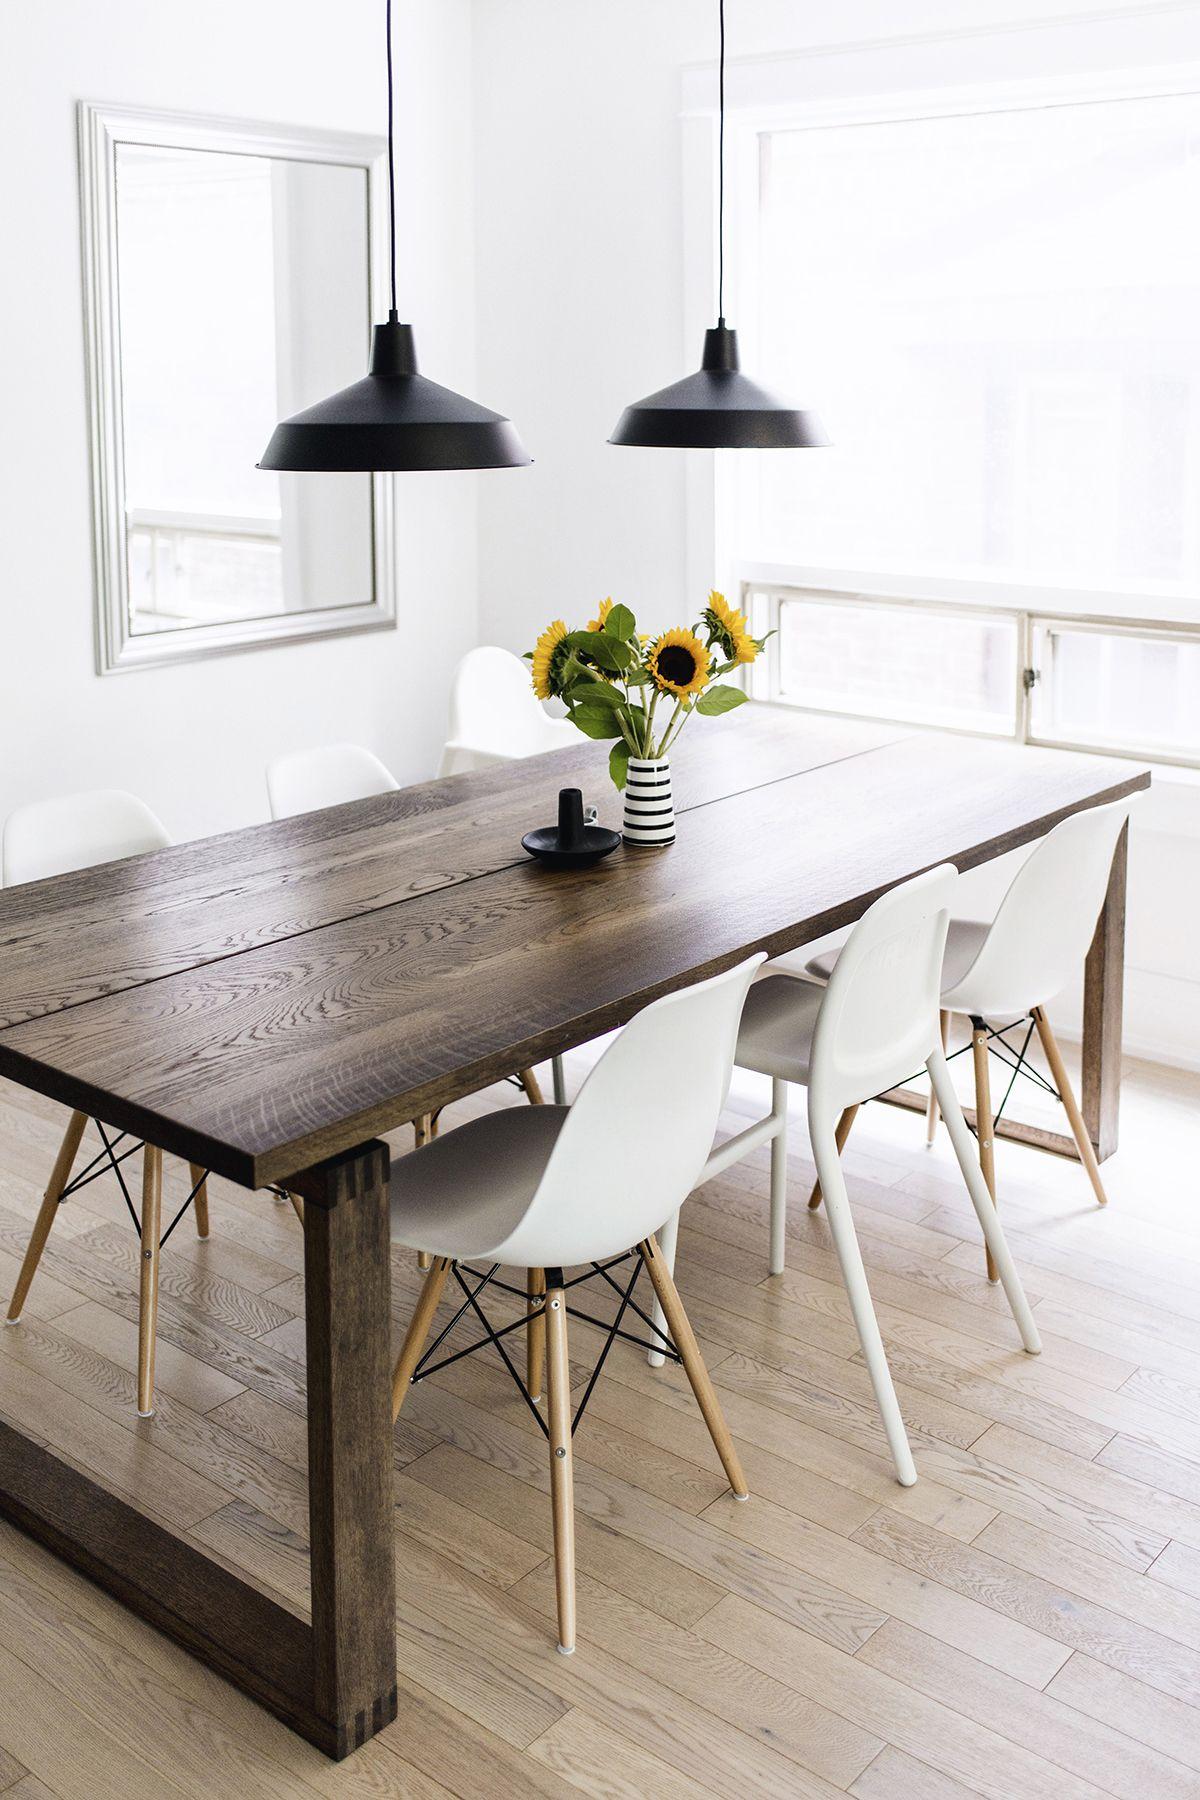 Scandinavianinspired dining room mörbylånga table eames chairs